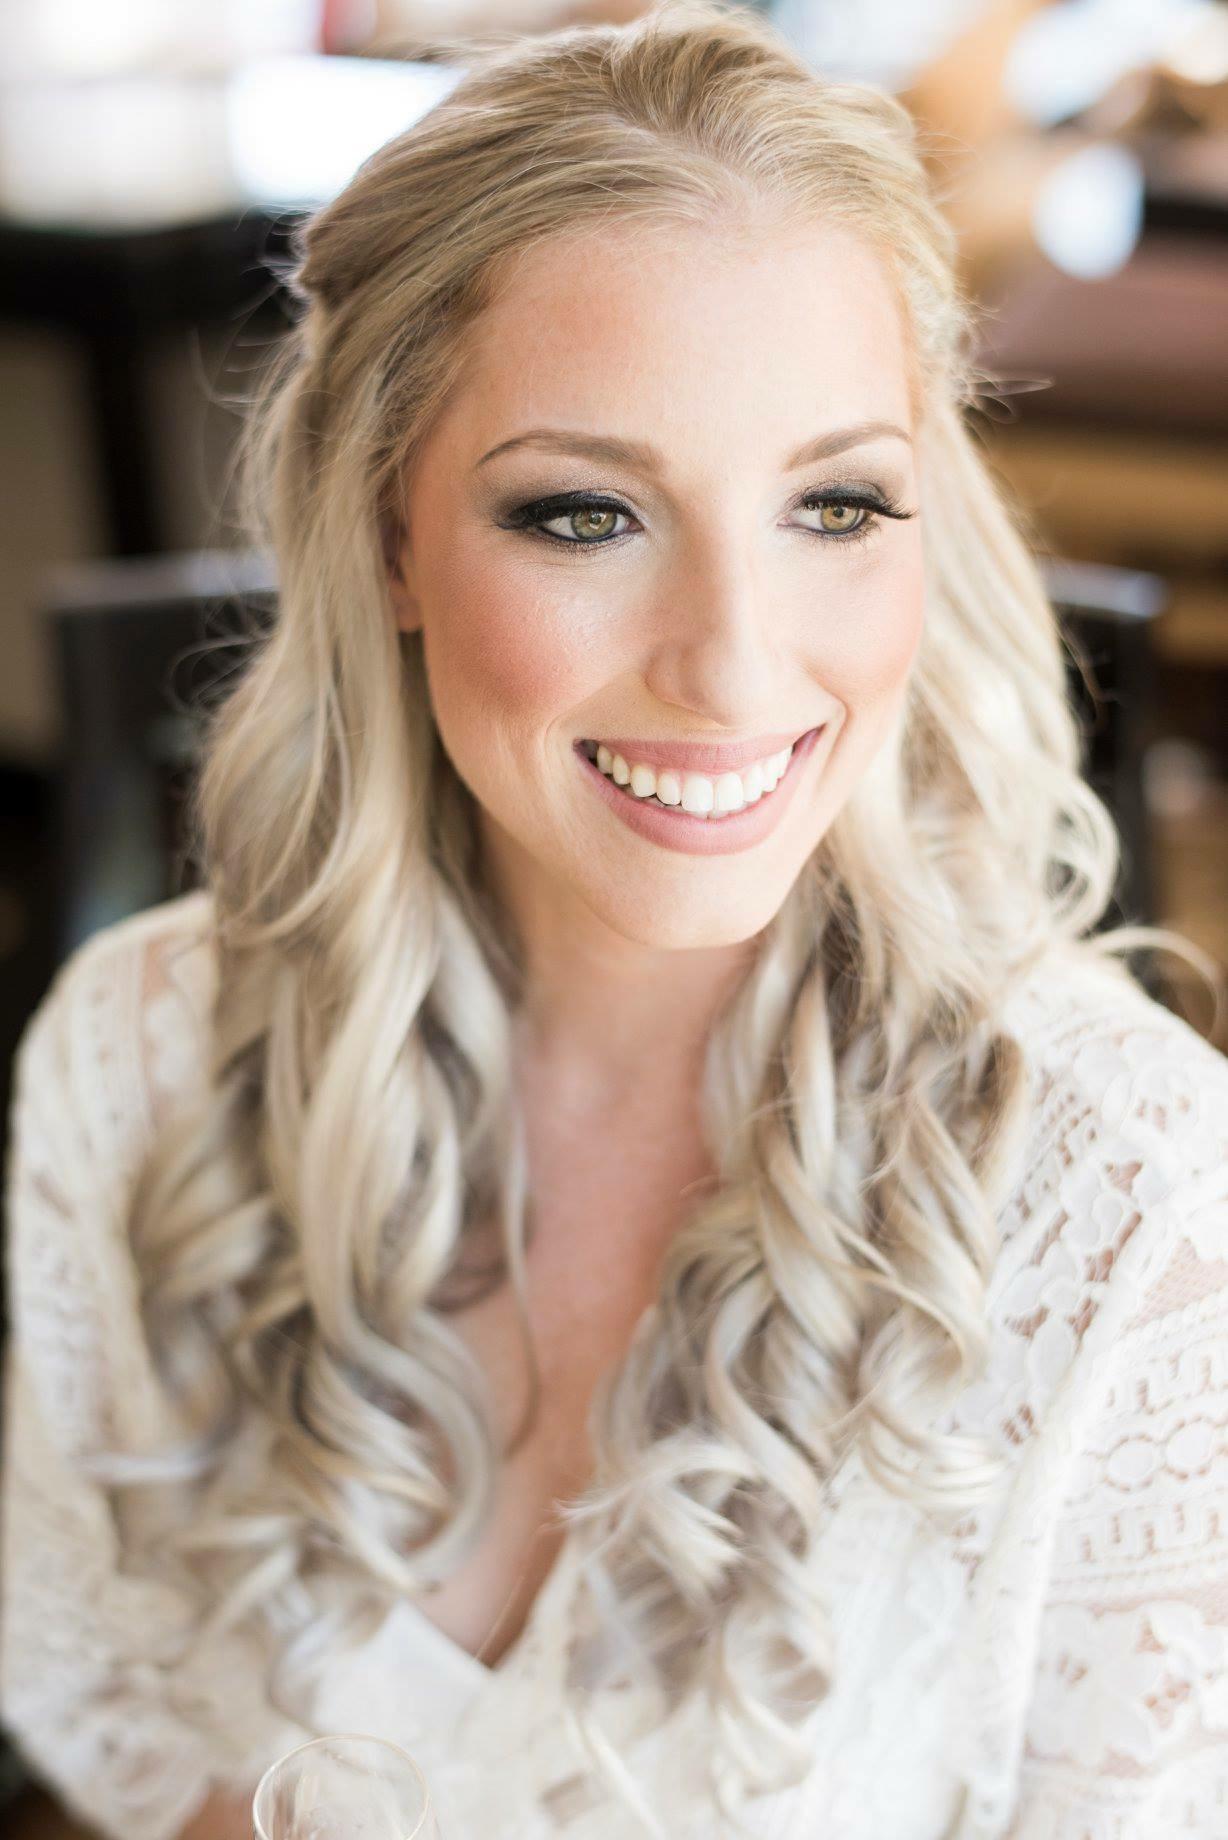 Vancouver Makeup Artist Yaletown